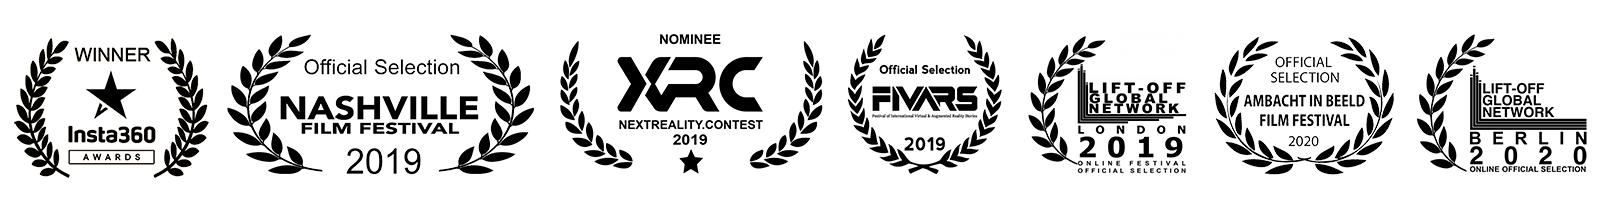 Fotomaterial Pressemitteilung Filmfestivals